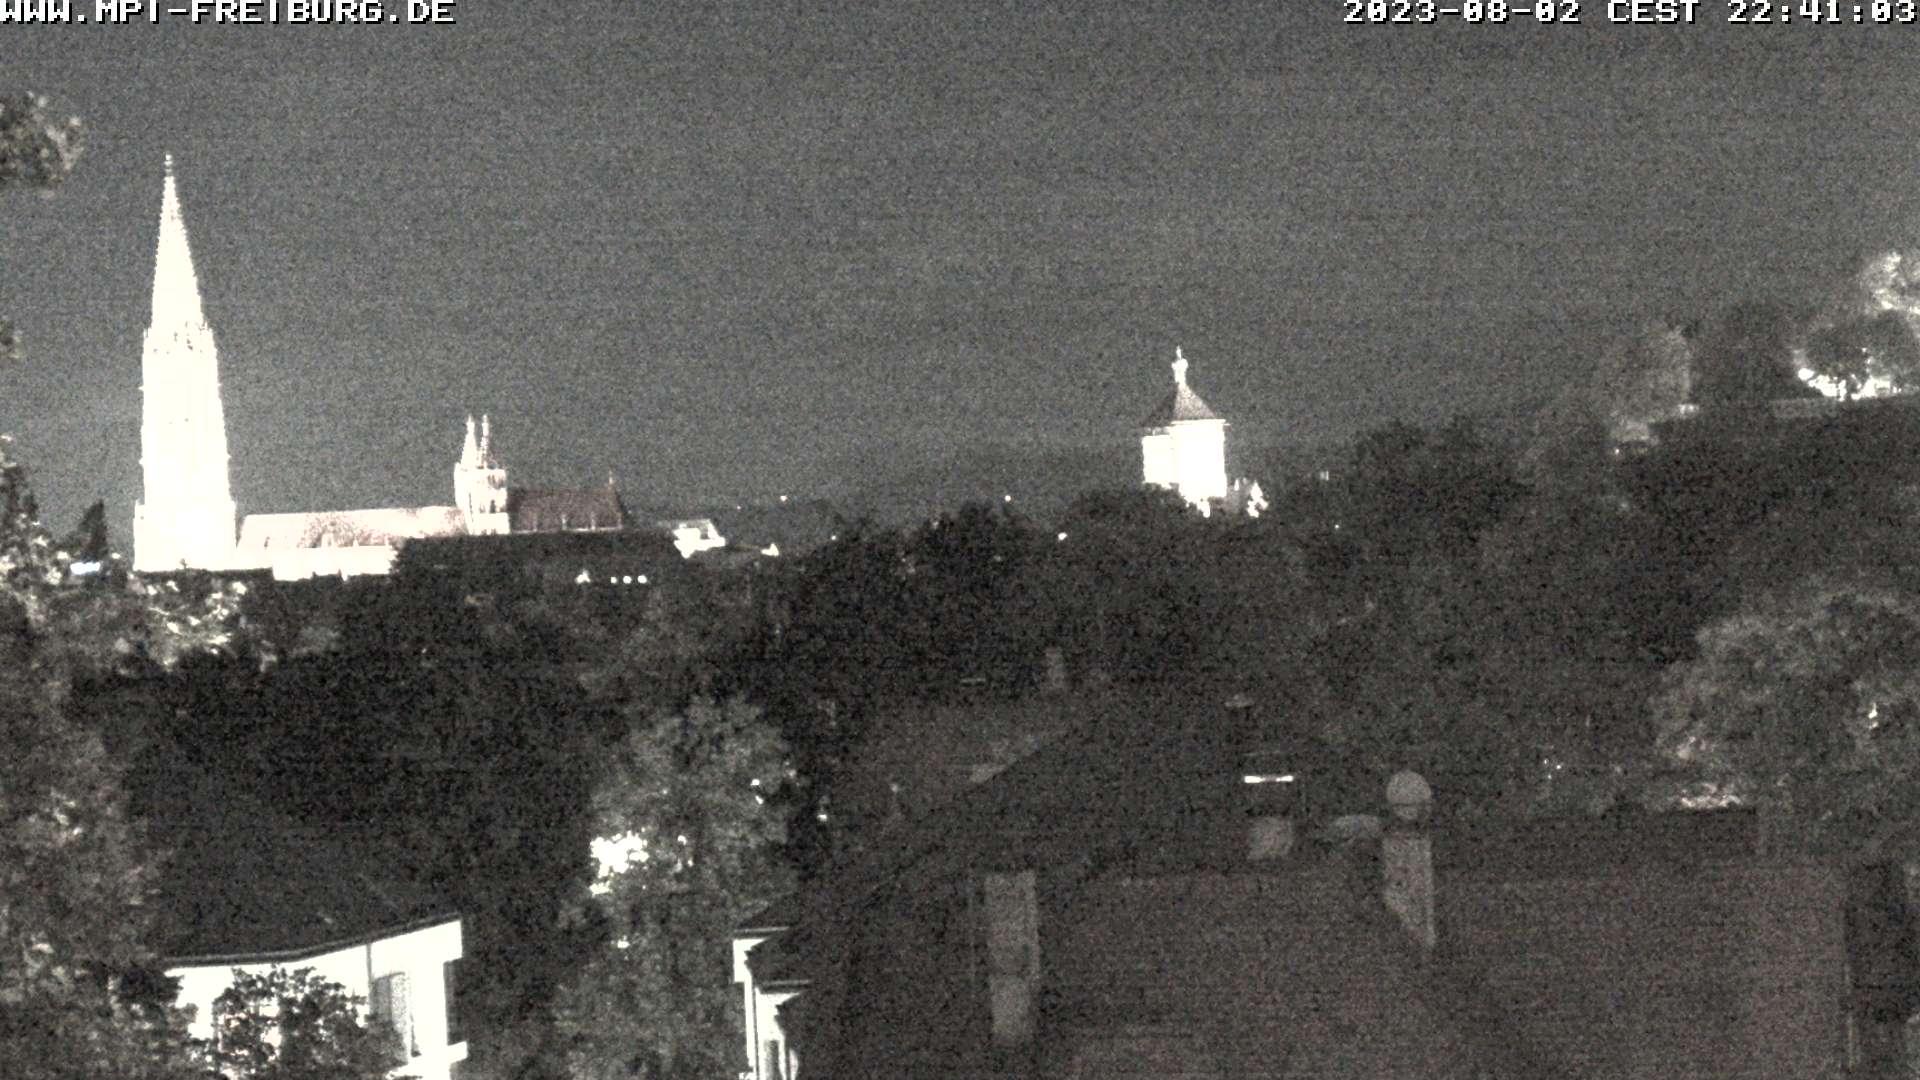 Webcam Freiburg, Freiburg Wetter